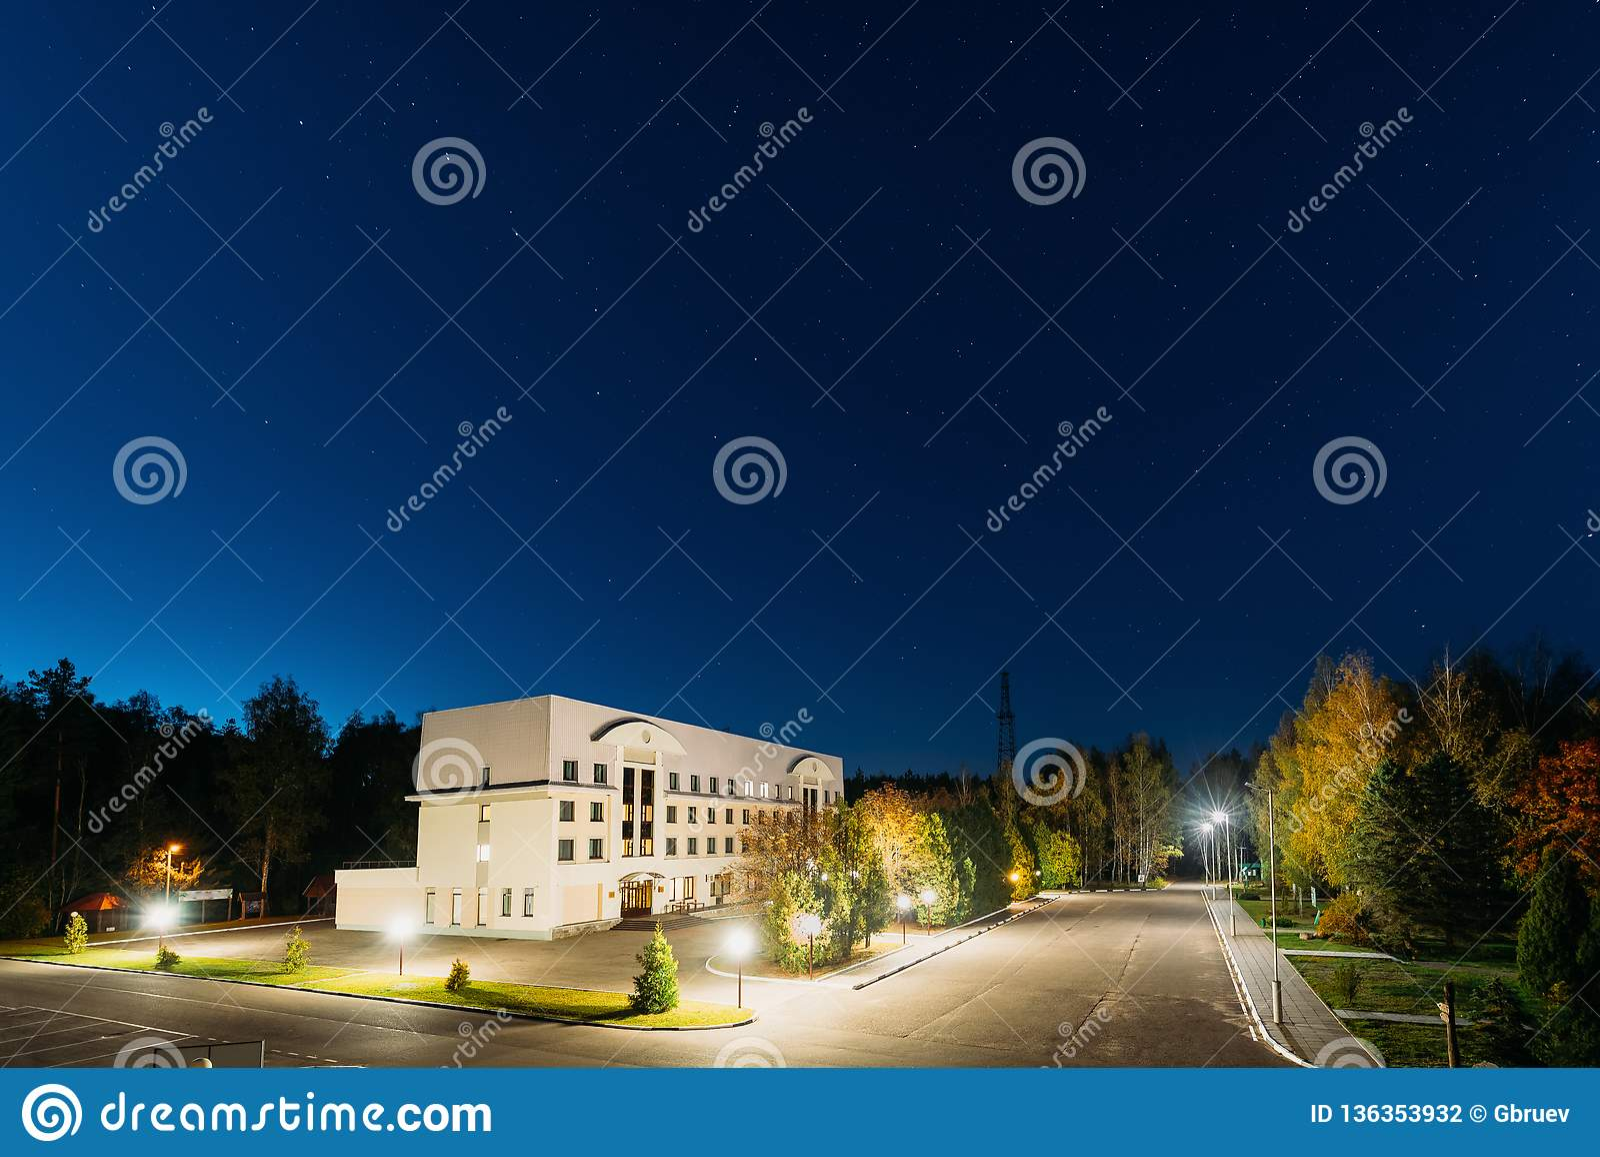 Domzheritsy, regione di Vitebsk, Bielorussia Hotel Serguch complesso in B